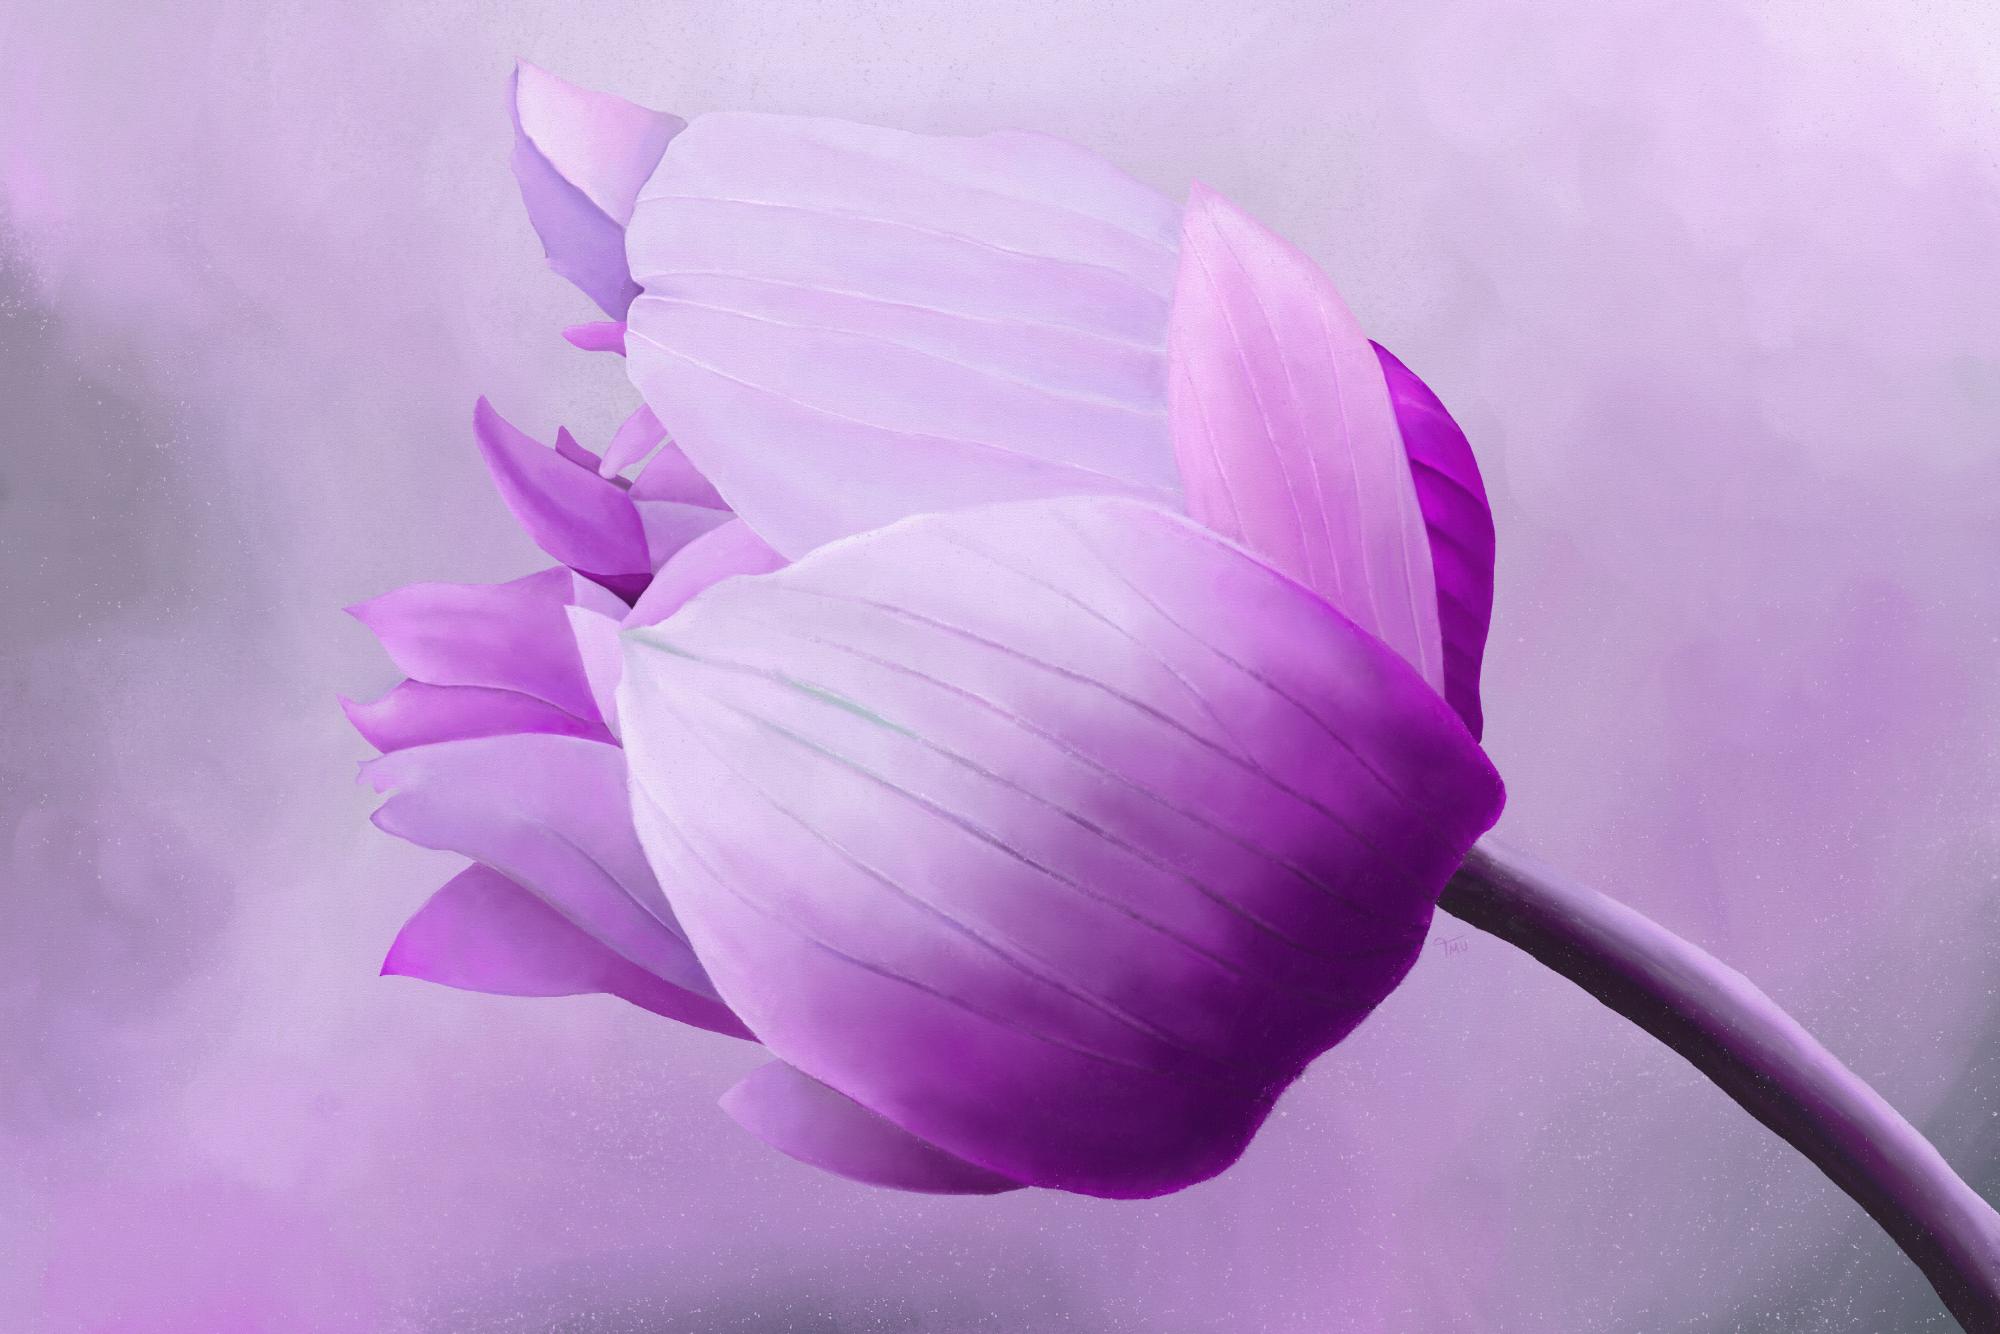 Digital painting of a purple anemone flower